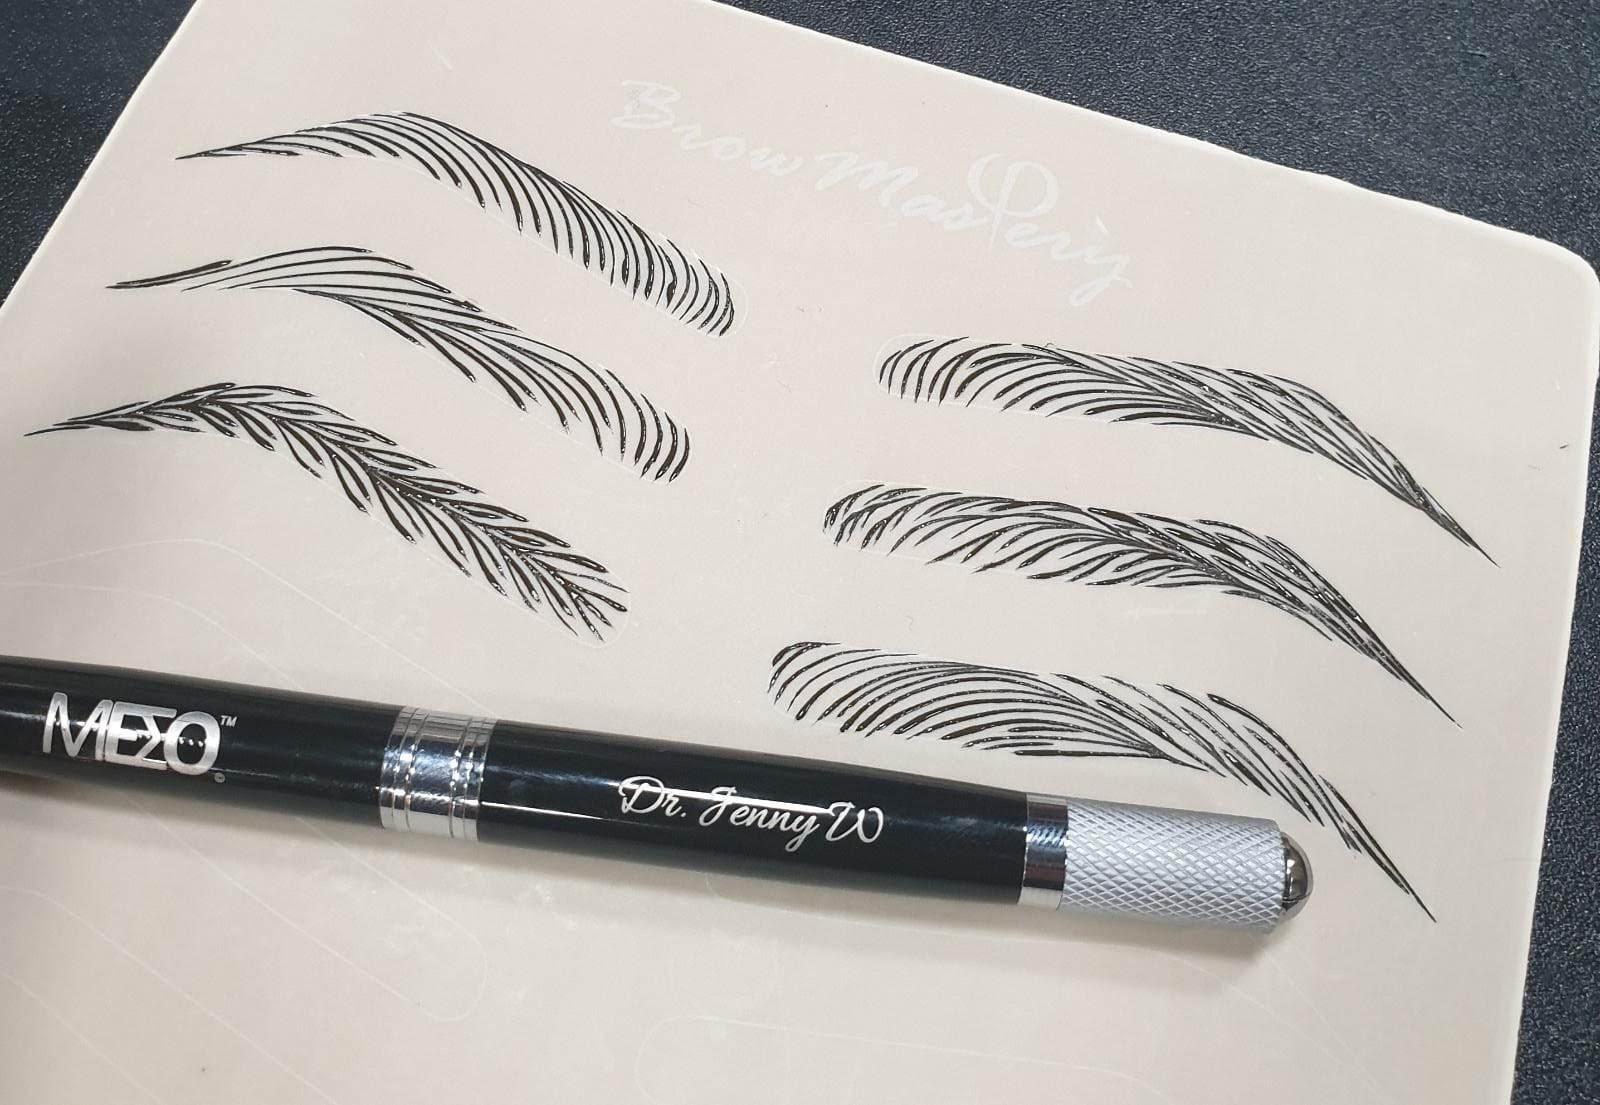 Advance Microblading Eyebrow Embroidery Course Singapore